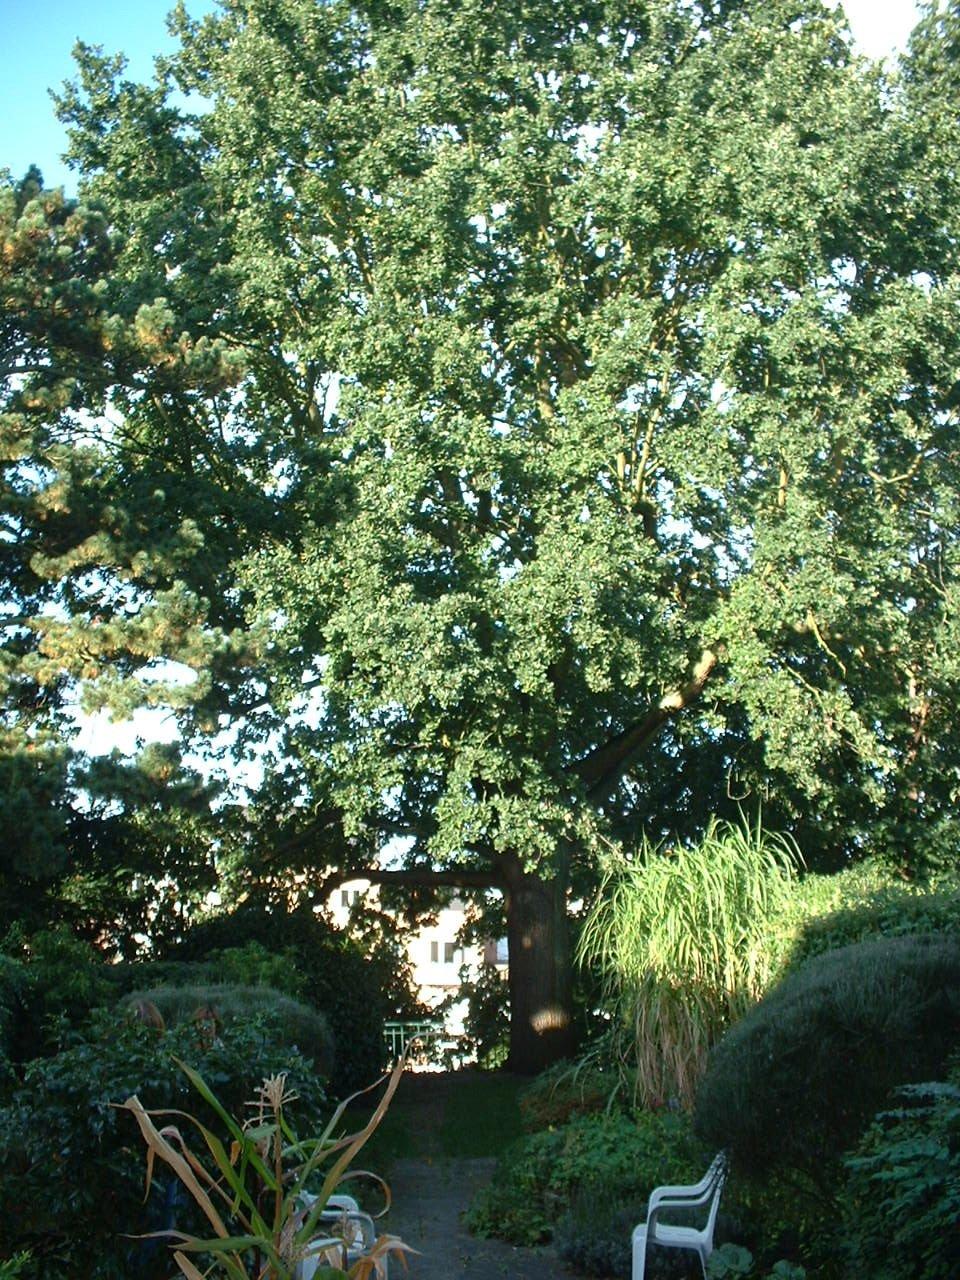 Chêne pédonculé – Uccle, Avenue Henri Pirenne, 19 –  27 Septembre 2005